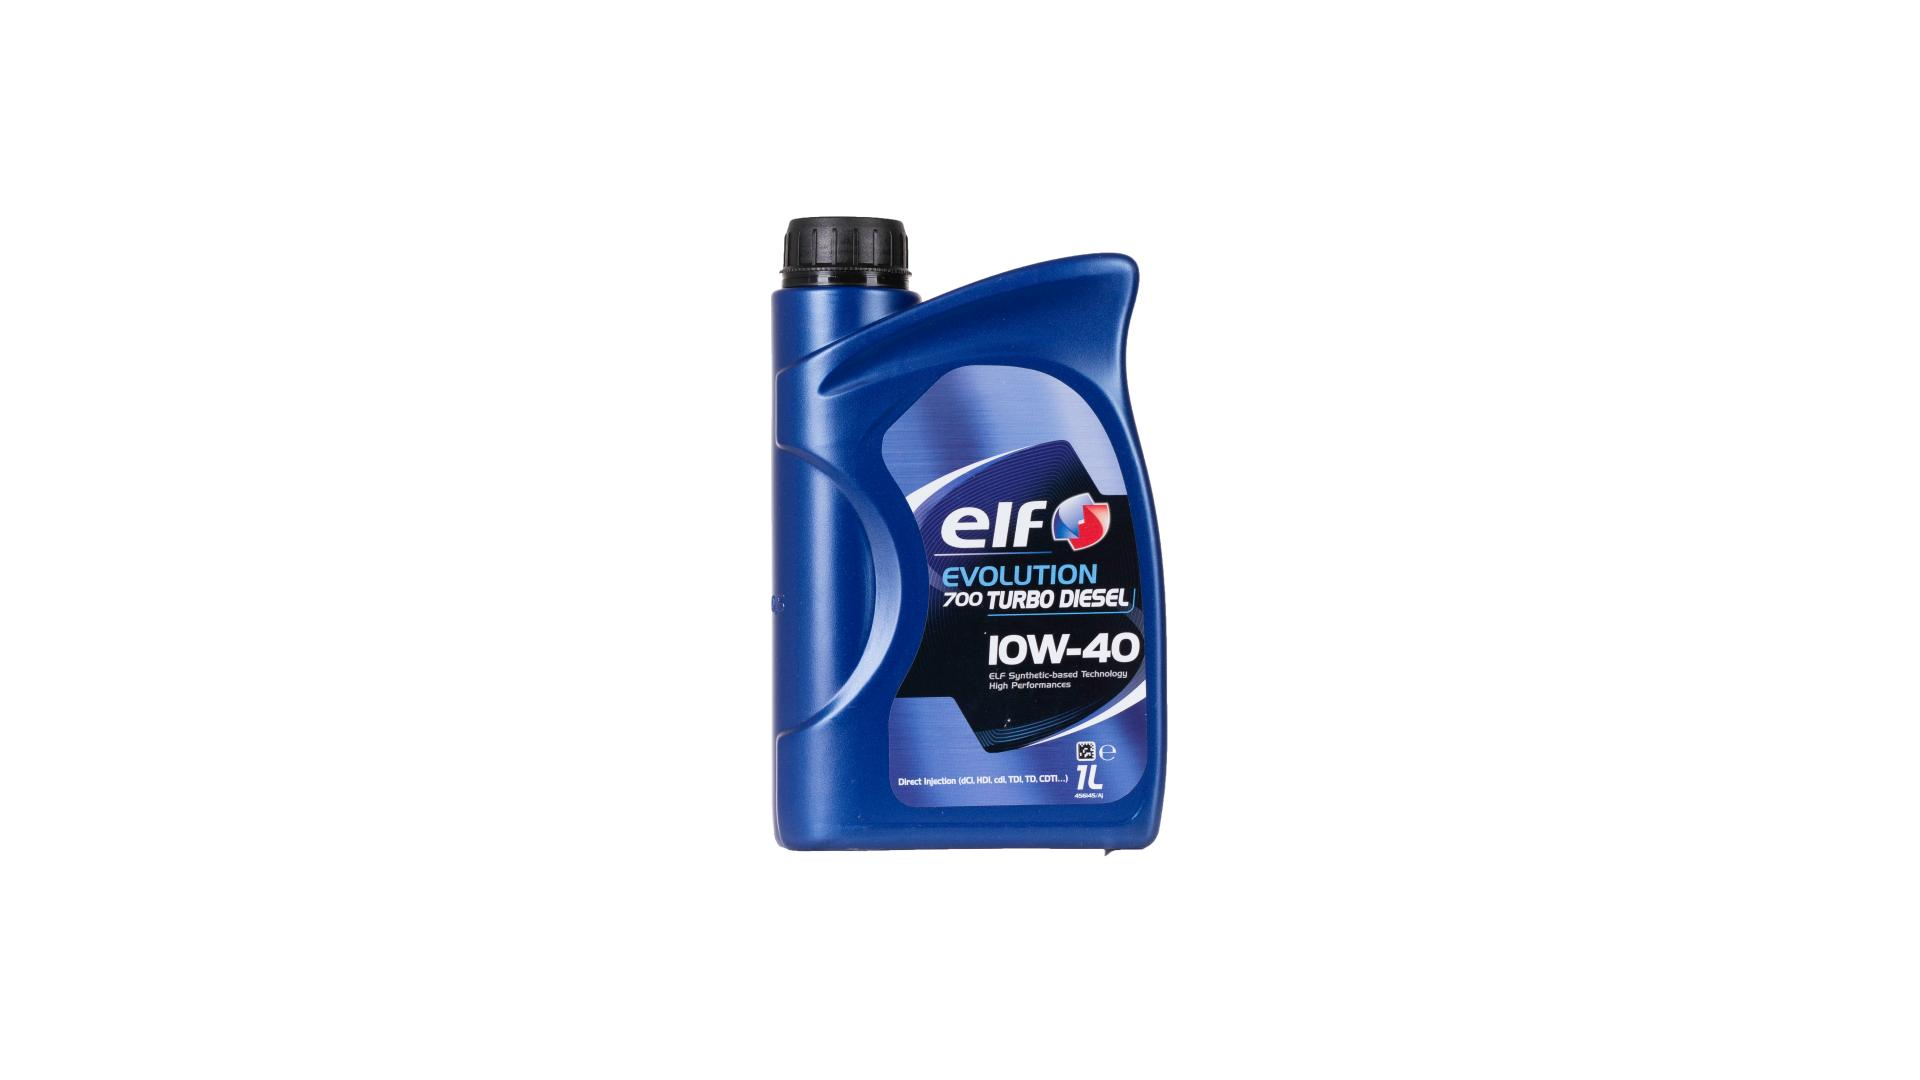 Elf 10w-40 Evolution 700 TD 1L (201558)